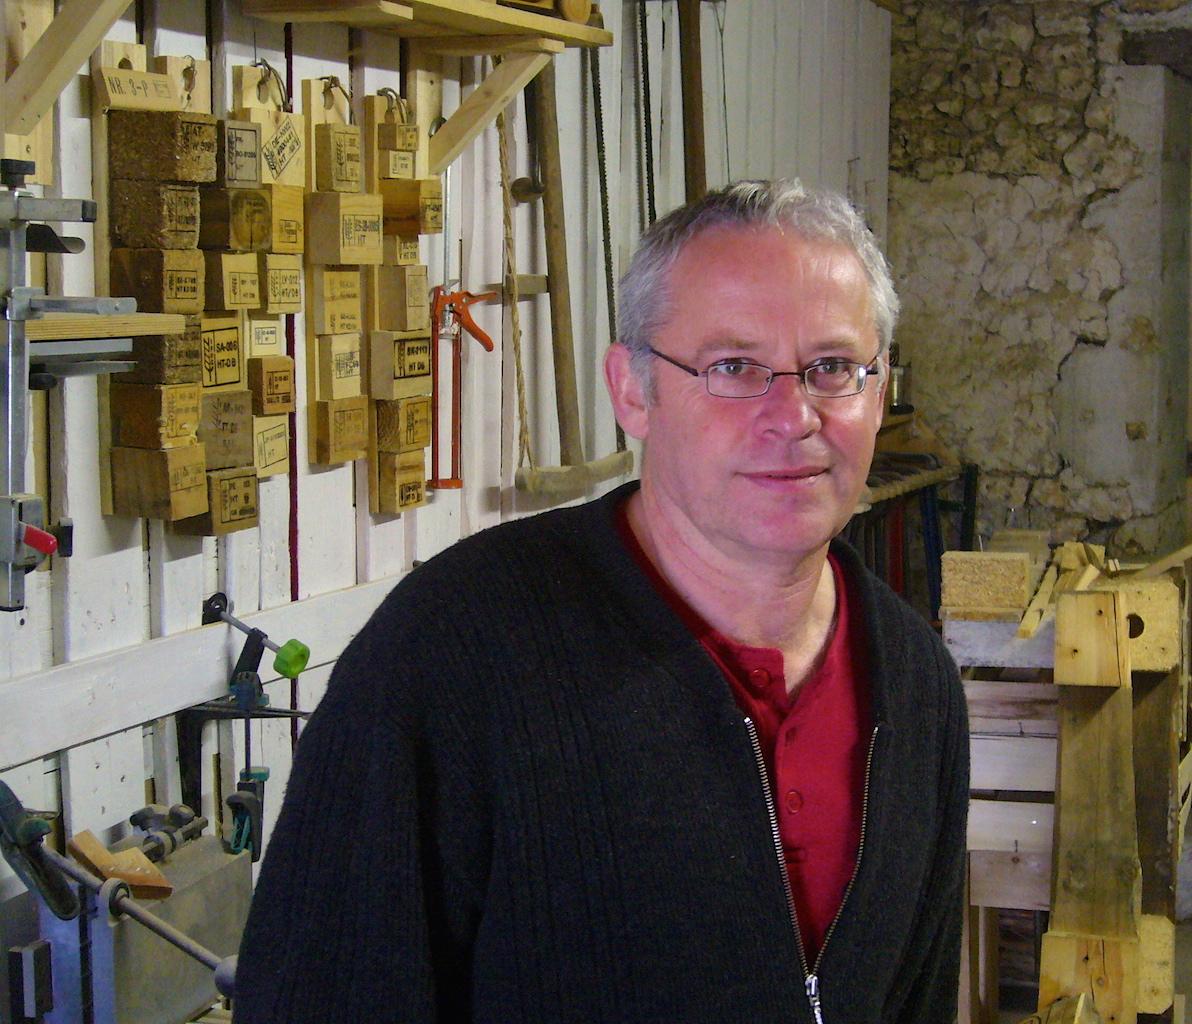 Pierre-Olivier Brasseur